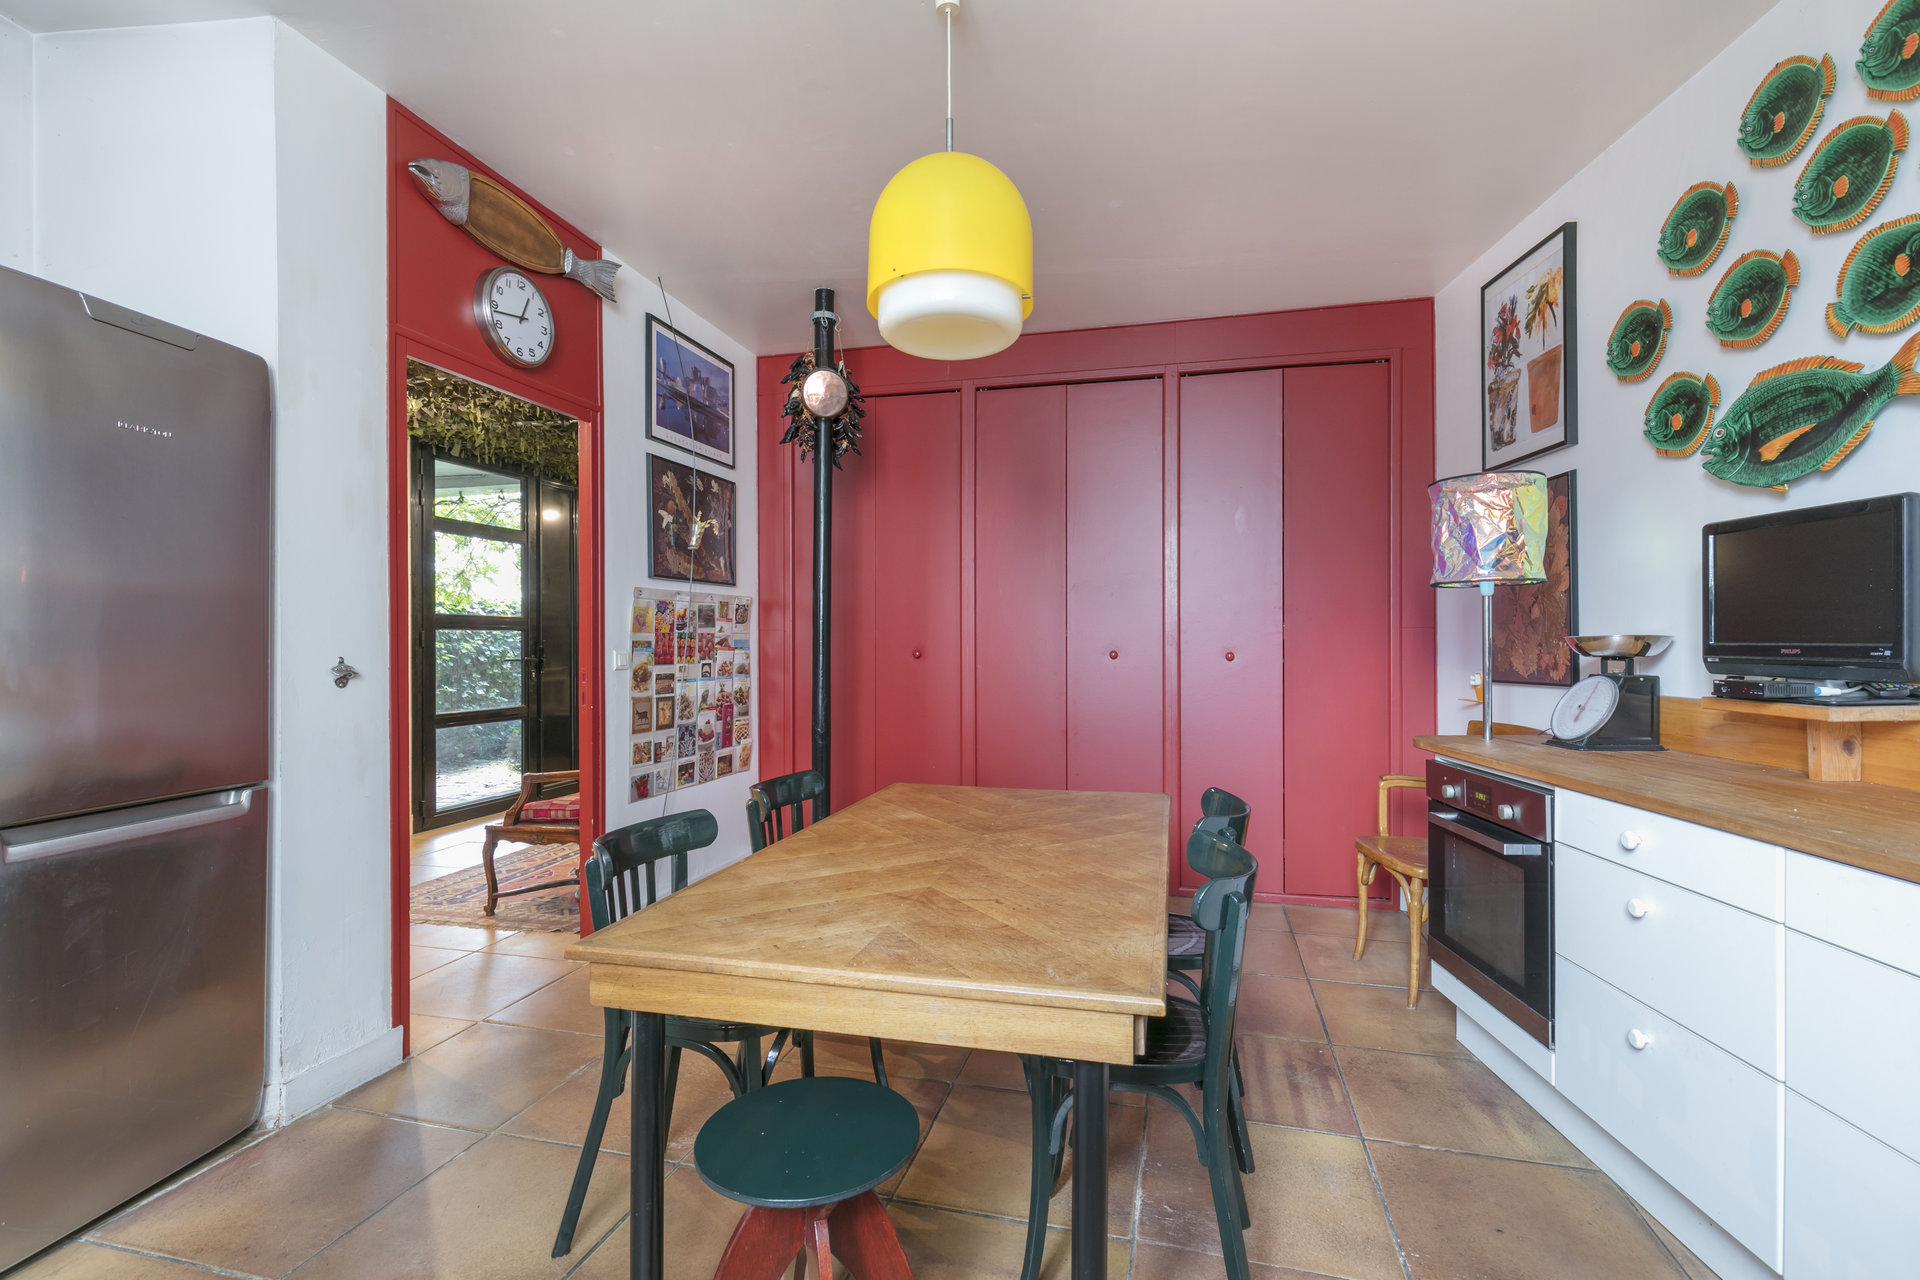 ancien-atelier-rehabilite-loft-a-vendre-rueil-malmaison-cheminee-garage-cave-espace-grenier